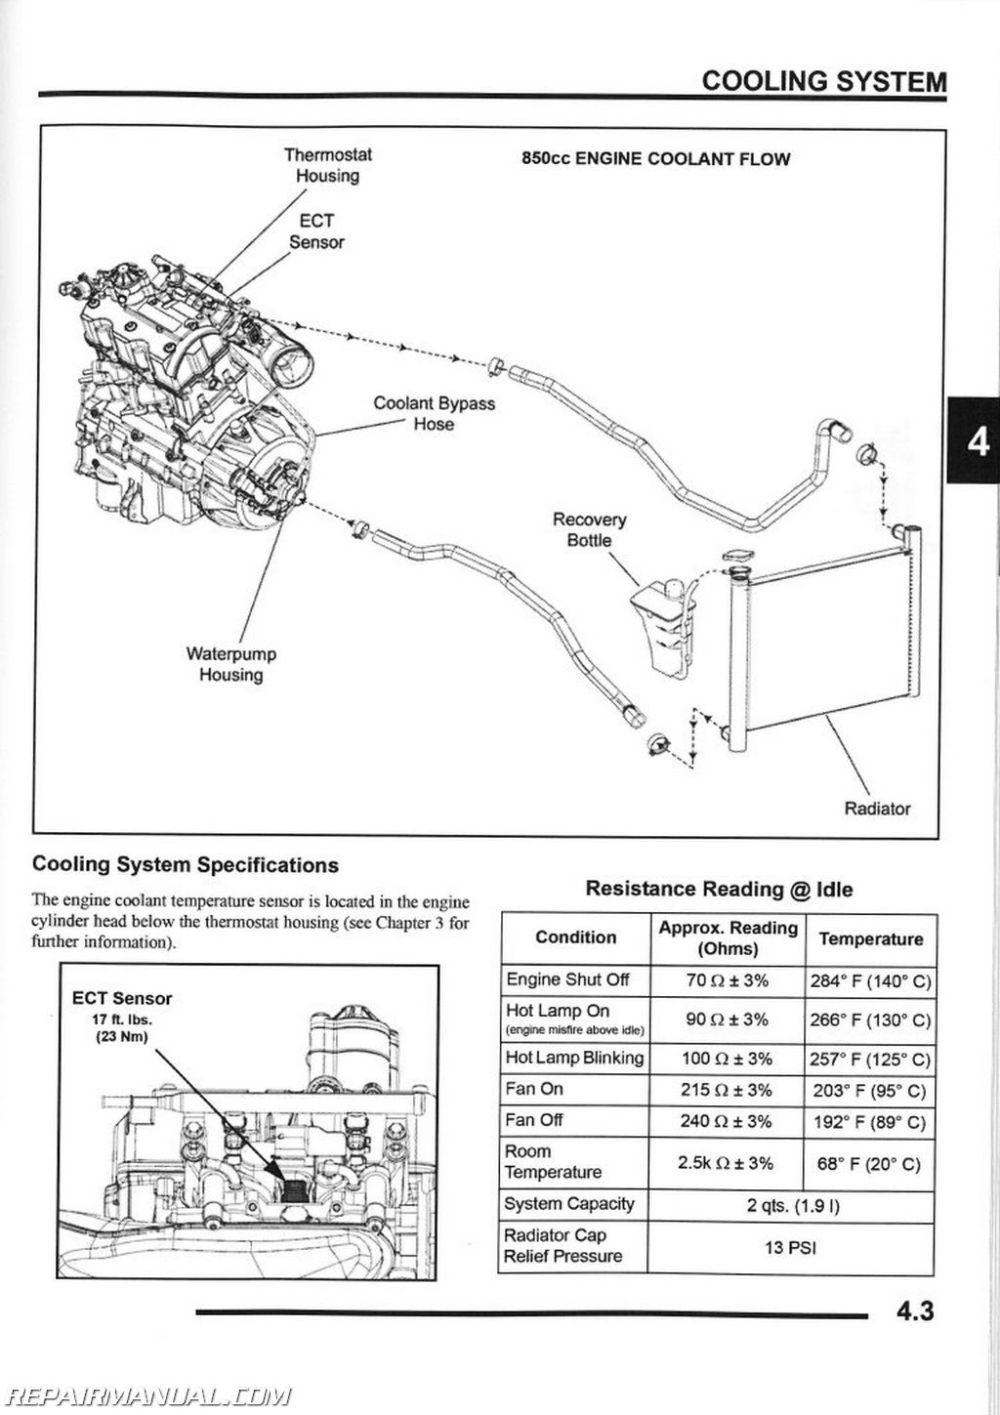 medium resolution of  2009 polaris sportsman xp 850 atv service manual